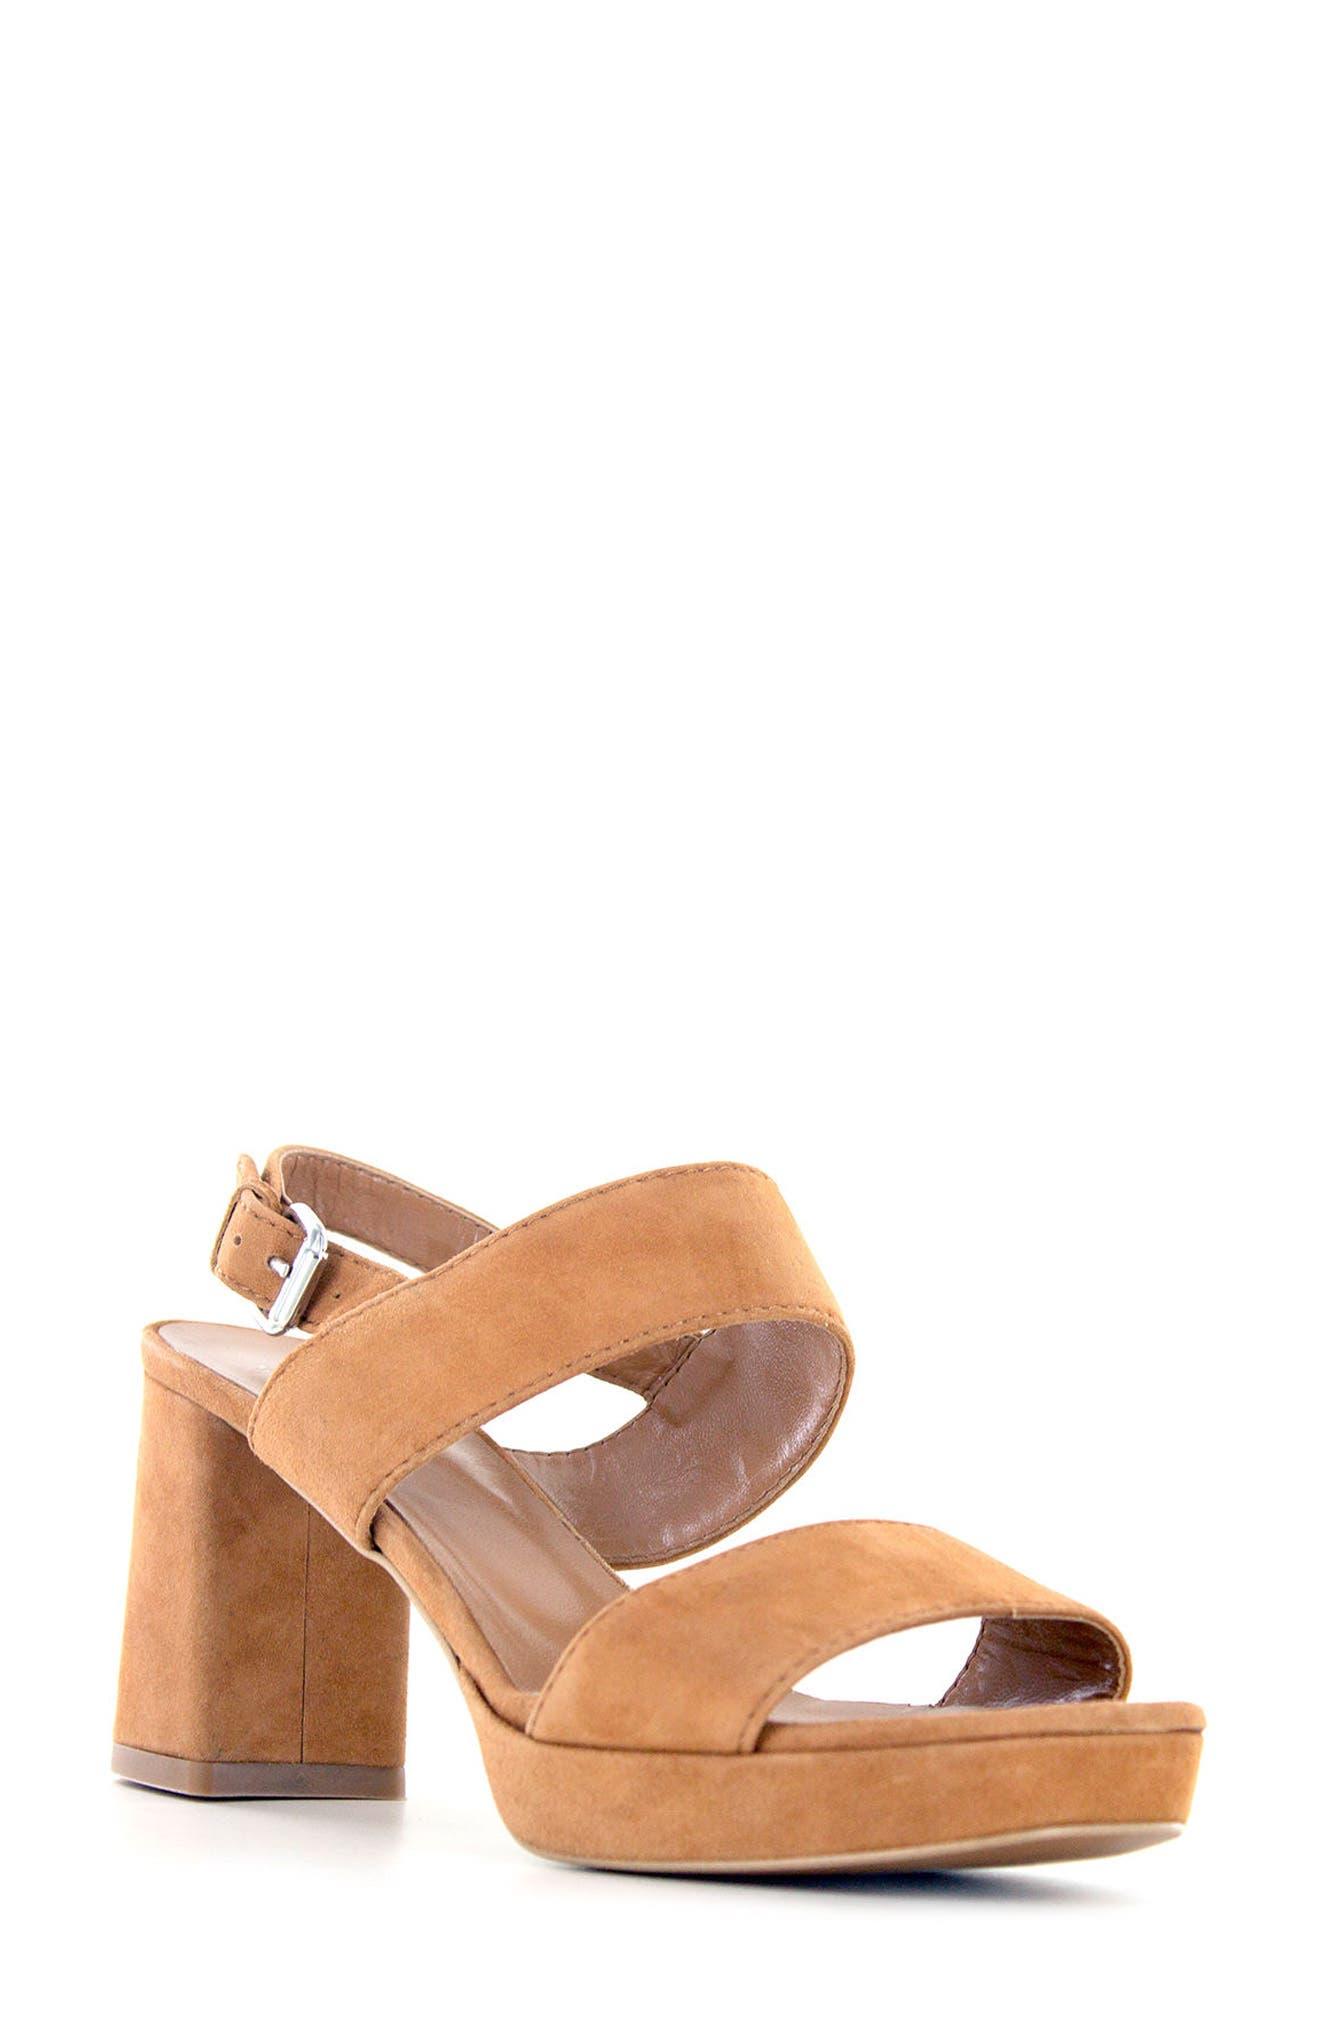 Main Image - Summit Emilia Block Heel Sandal (Women)